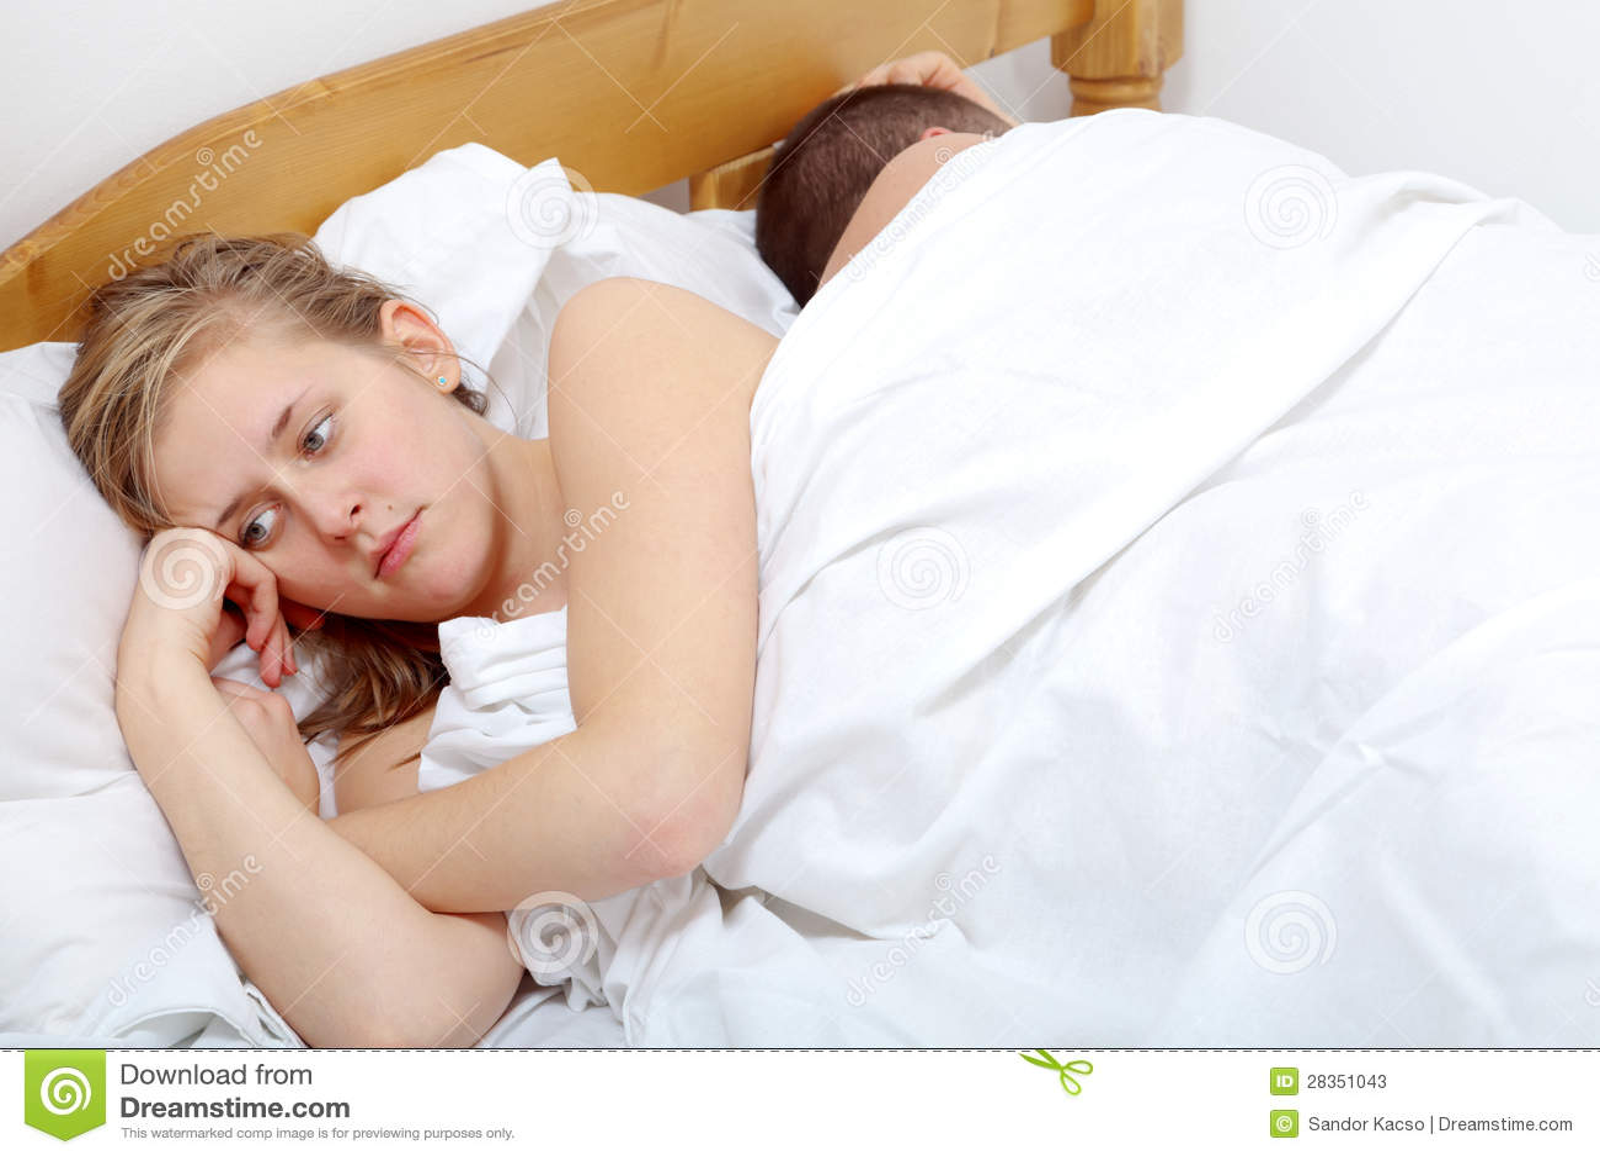 elya baskin wife sexual dysfunction in Chesapeake